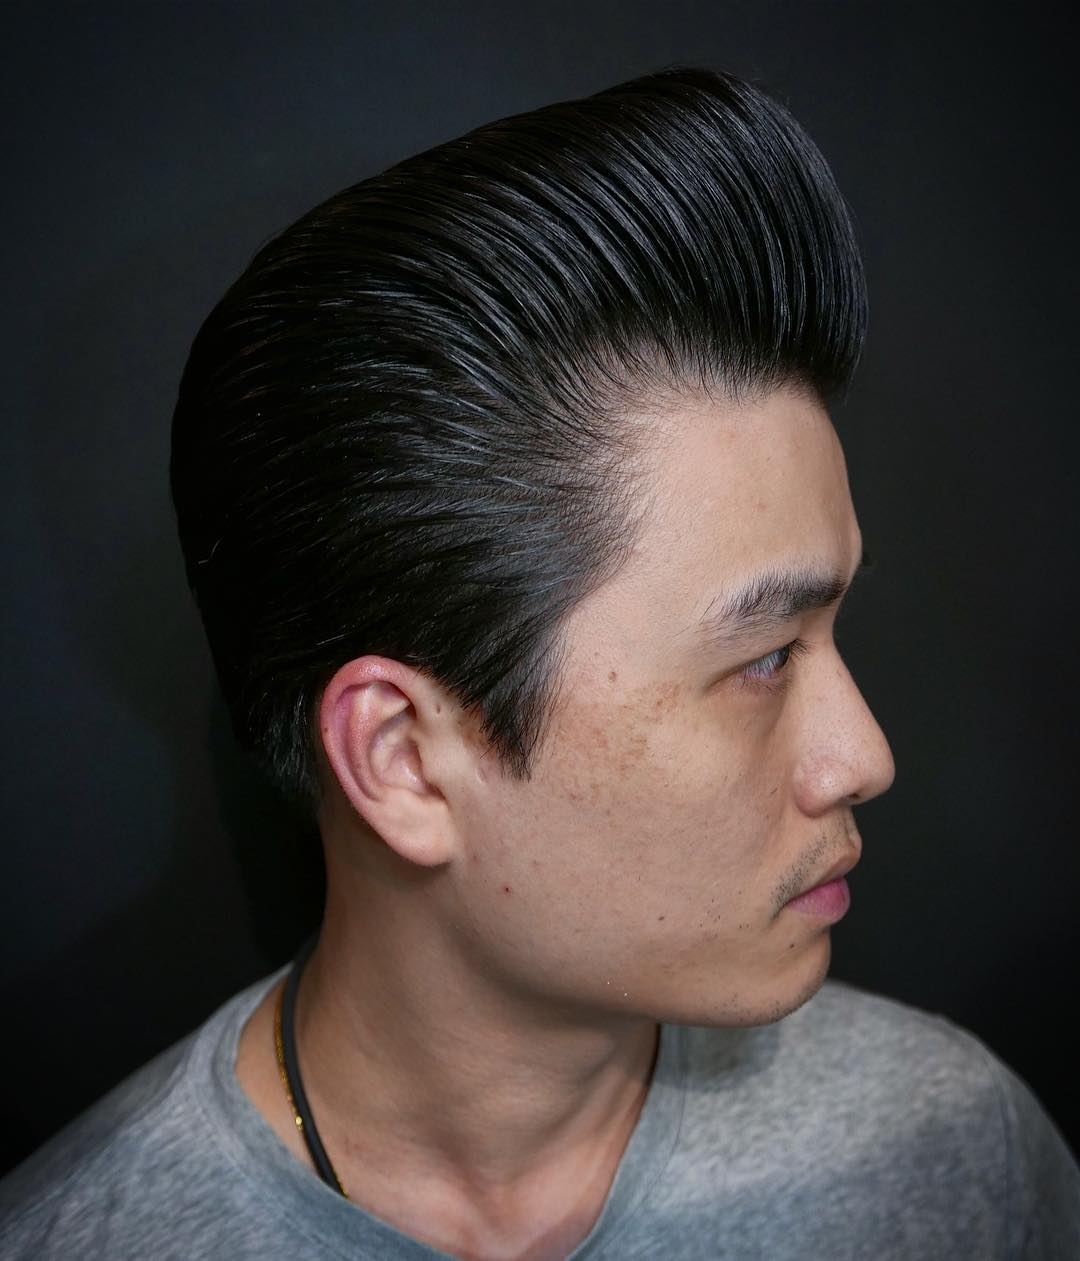 mikesr400 asain pompadour hairstyle pompadour haircut